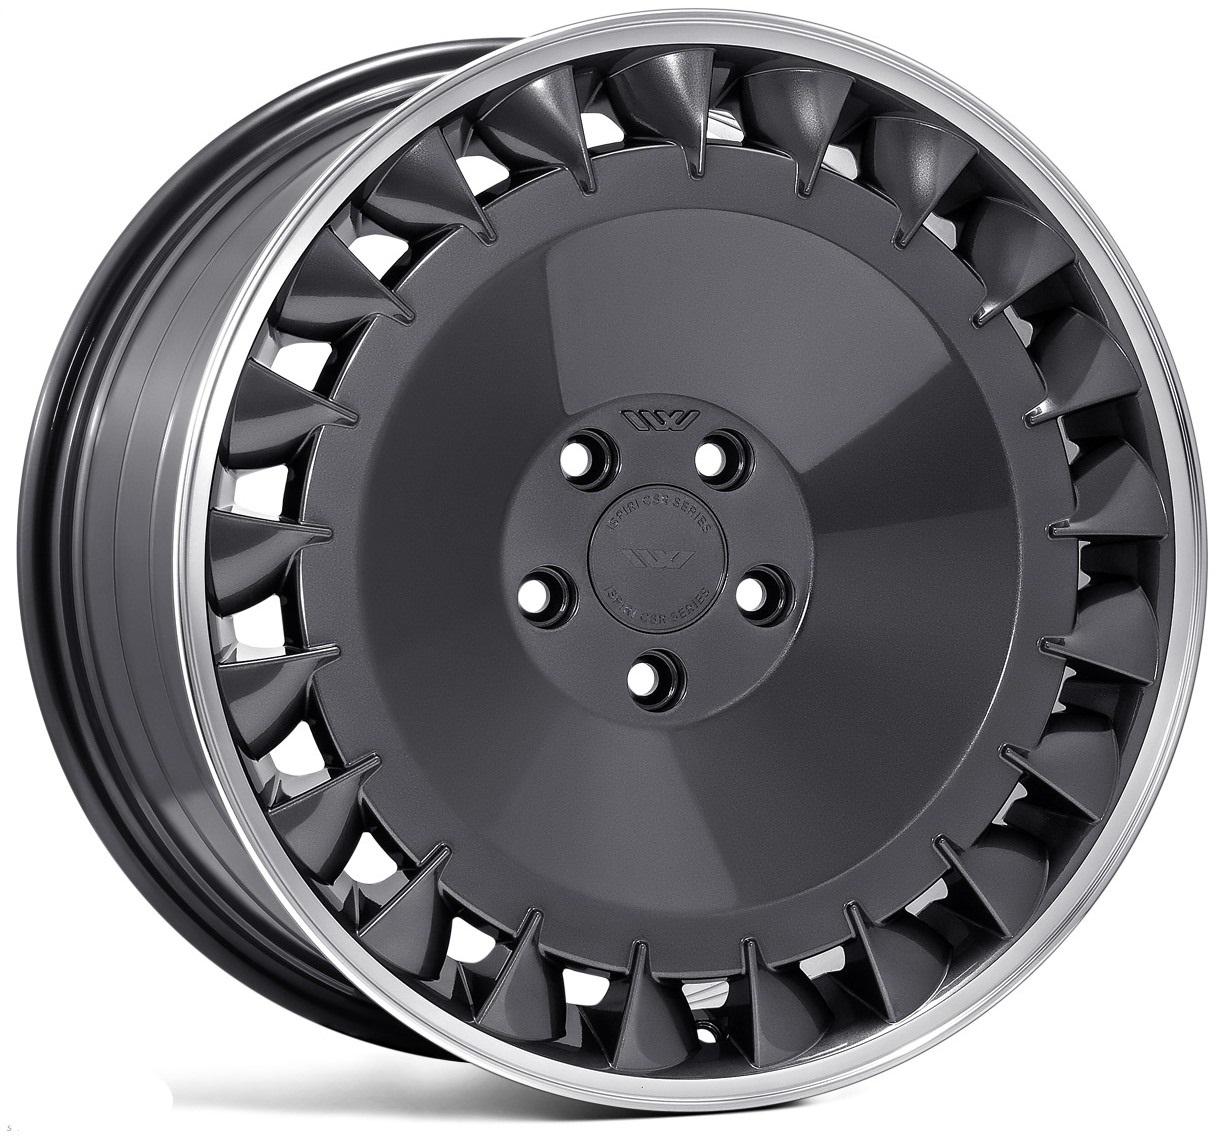 IW Automotive - CSRD-TF (Carbon Graphite Polished Lip)